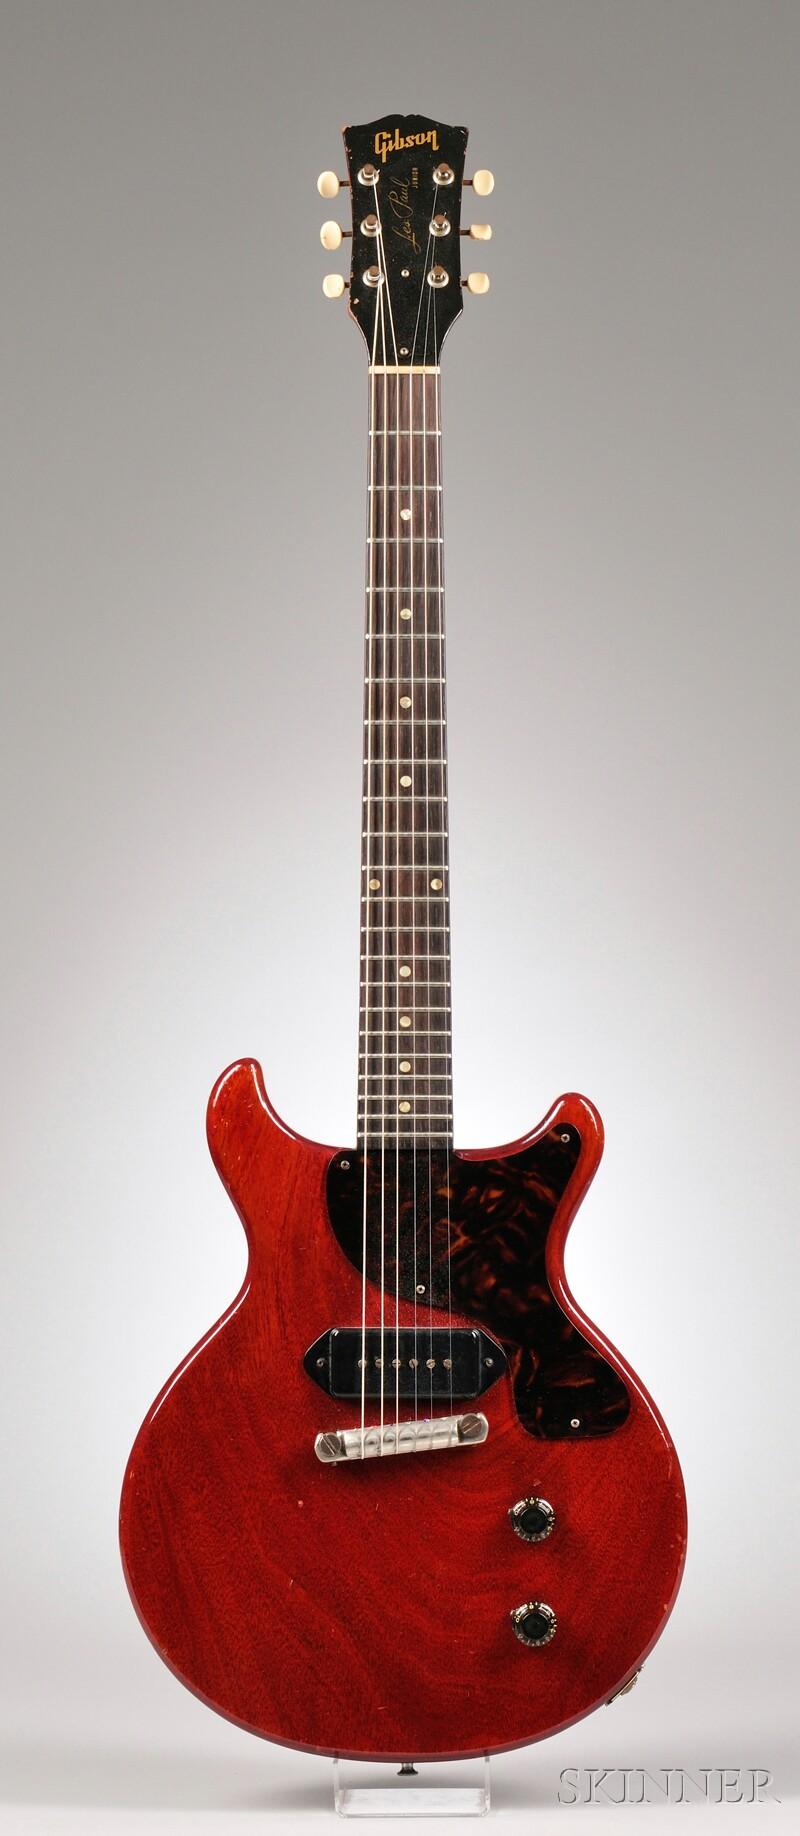 American Electric Guitar, Gibson Incorporated, Kalamazoo, 1959,   Style Les Paul Junior